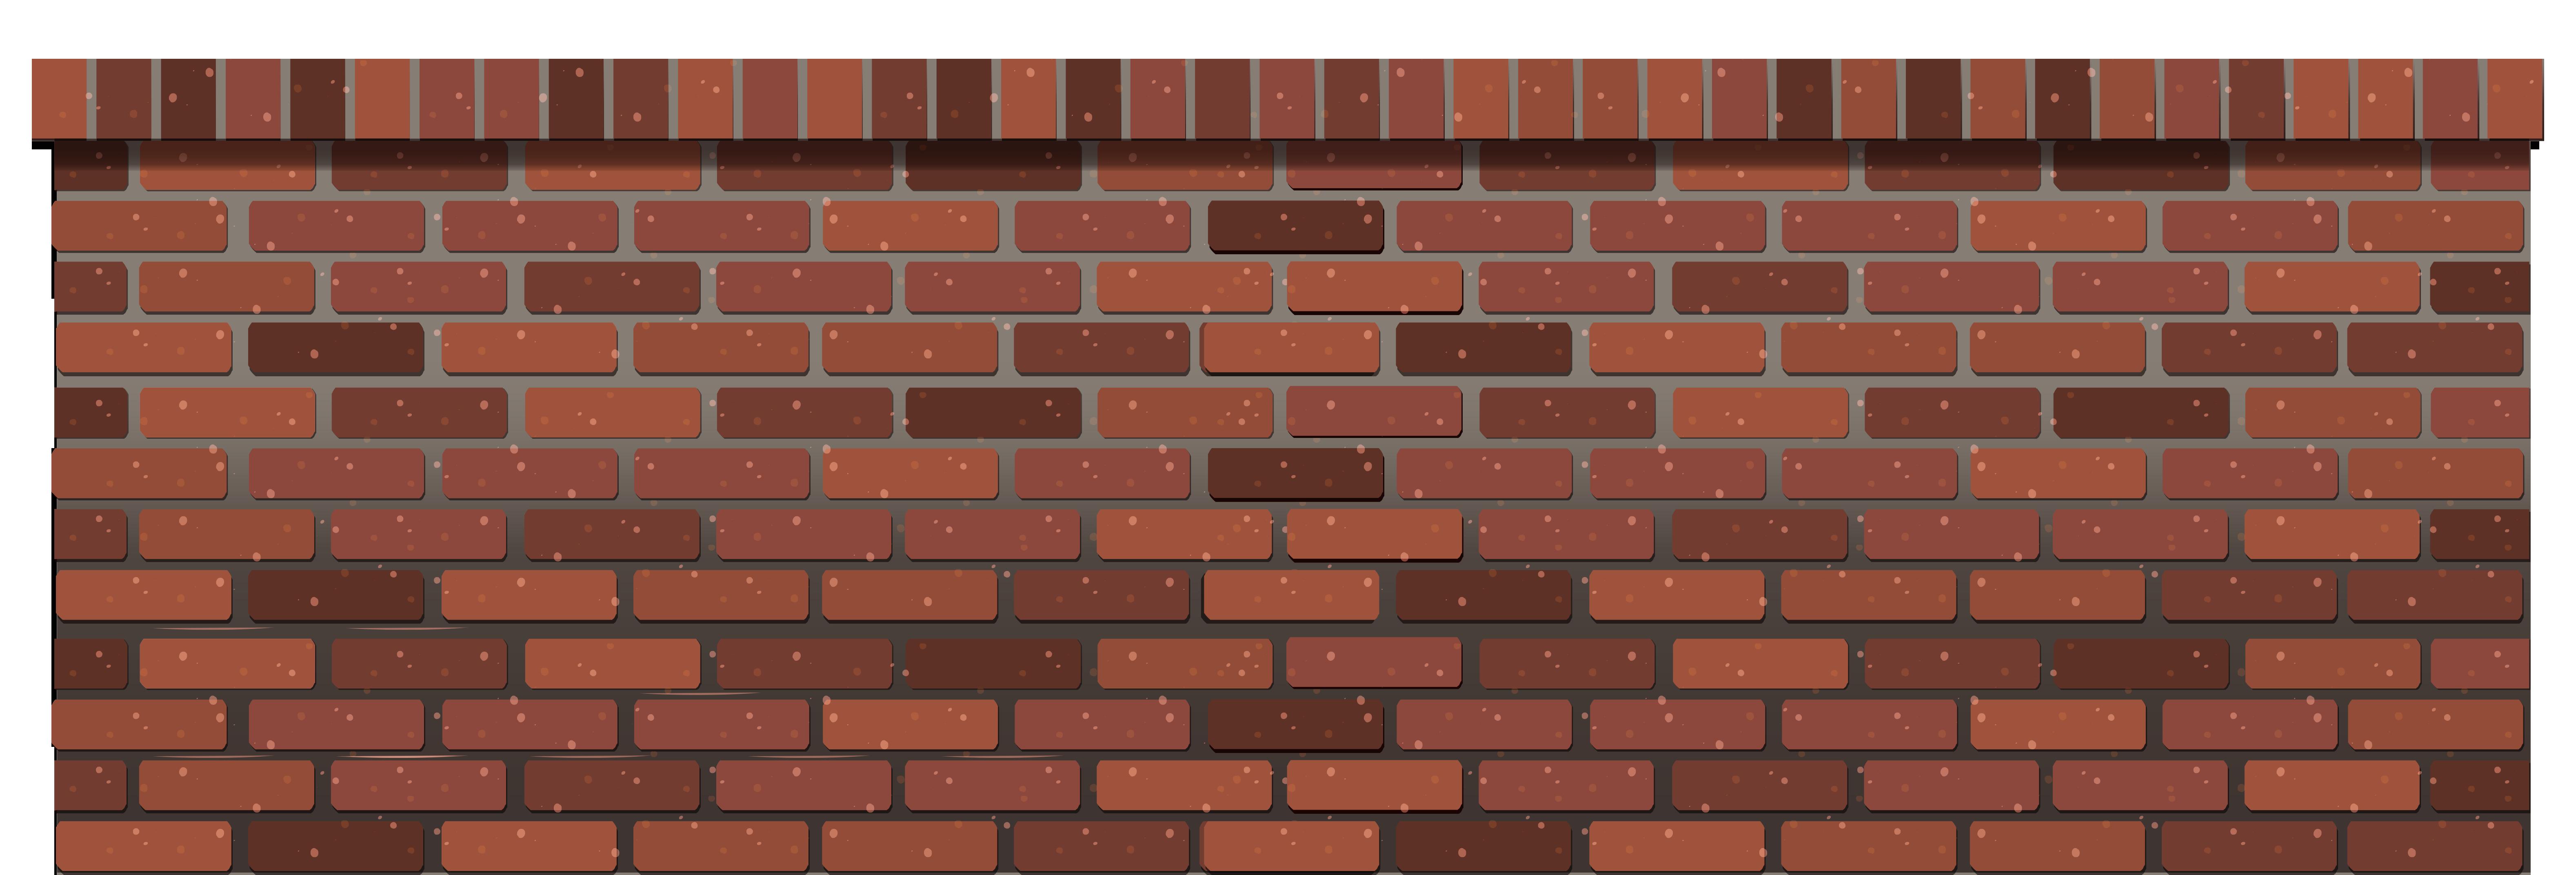 Brick clipart #1, Download drawings